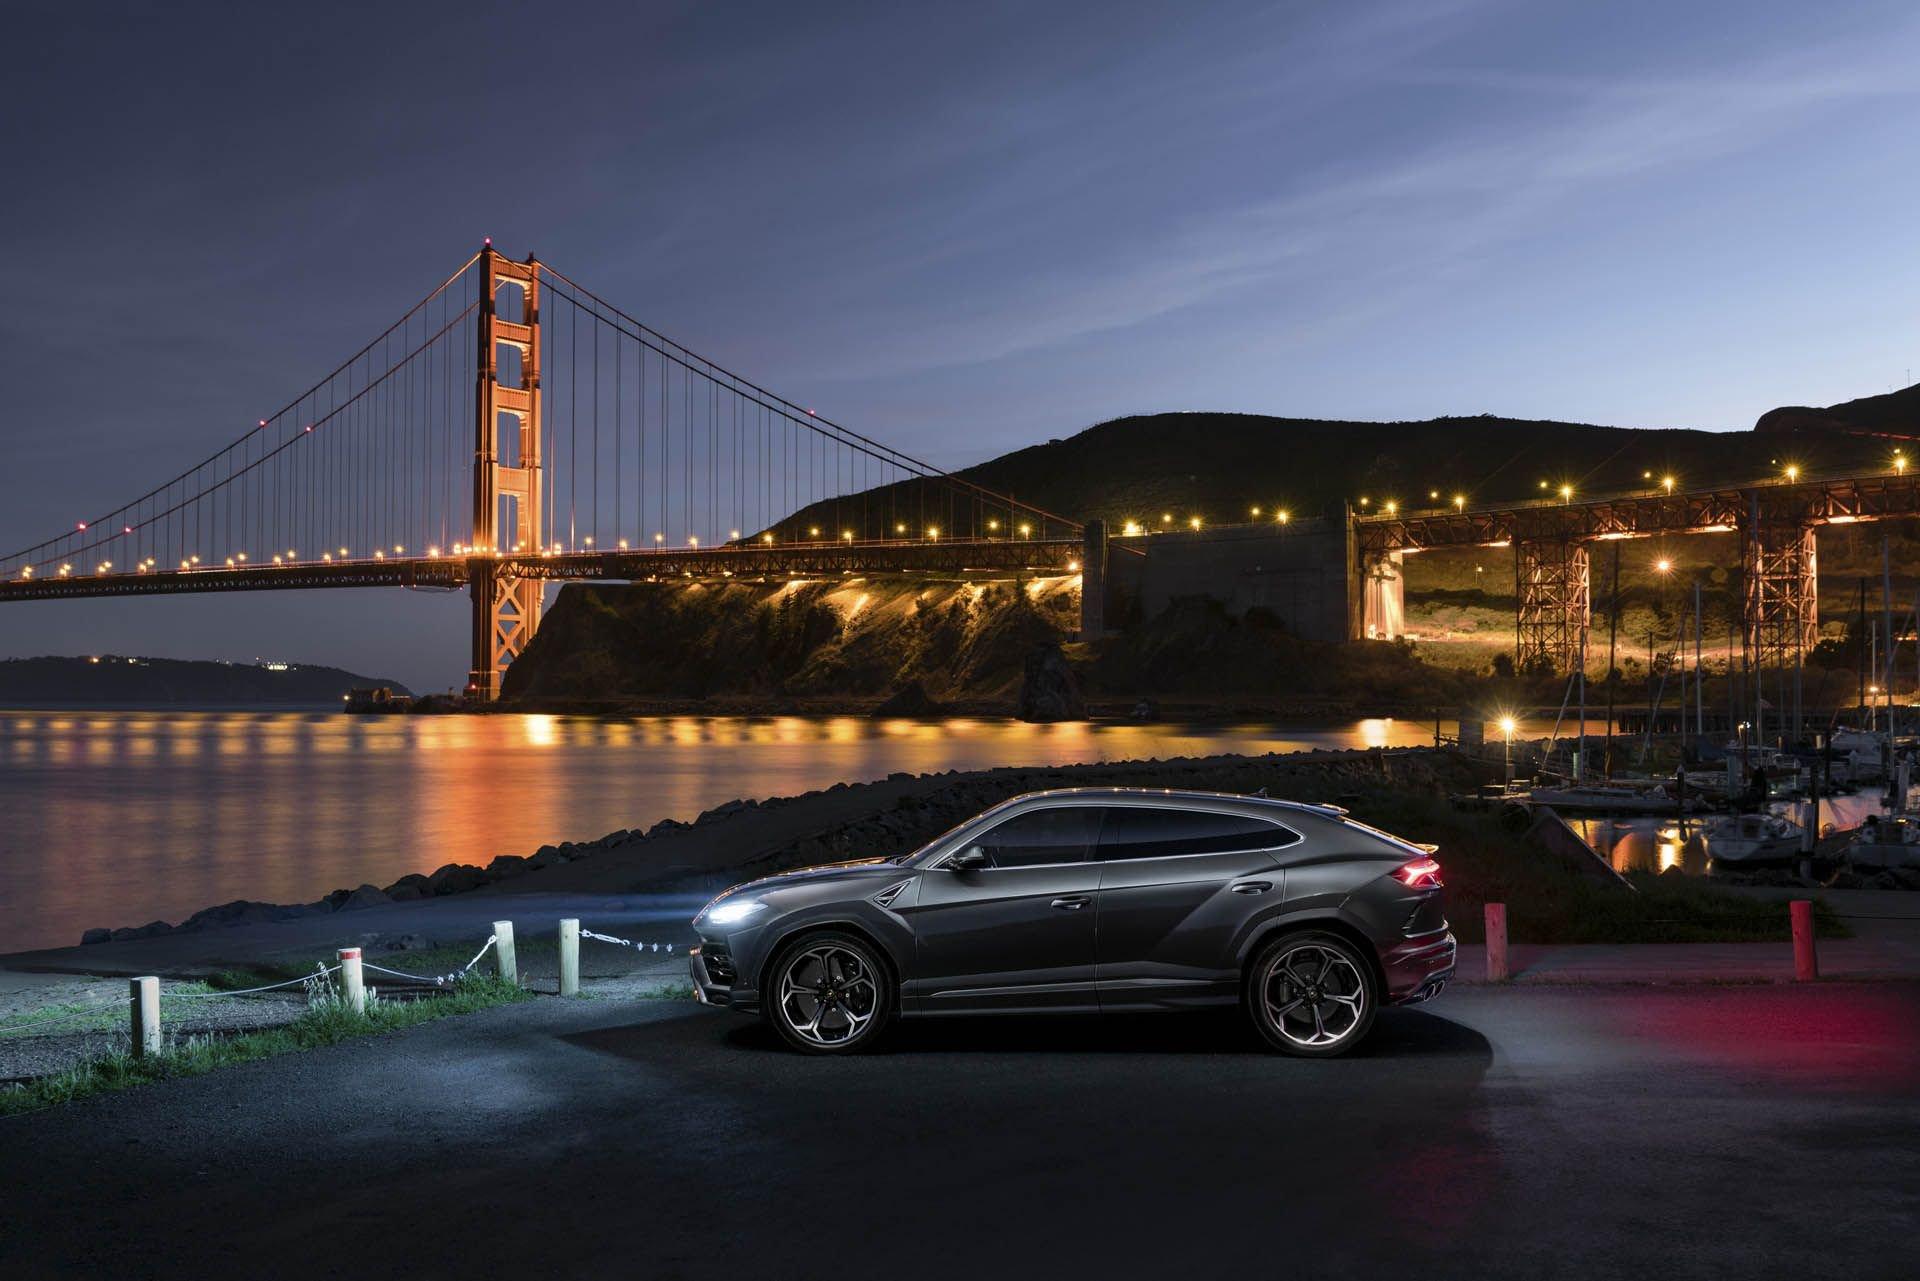 Lamborghini_Urus_world_tour_0020